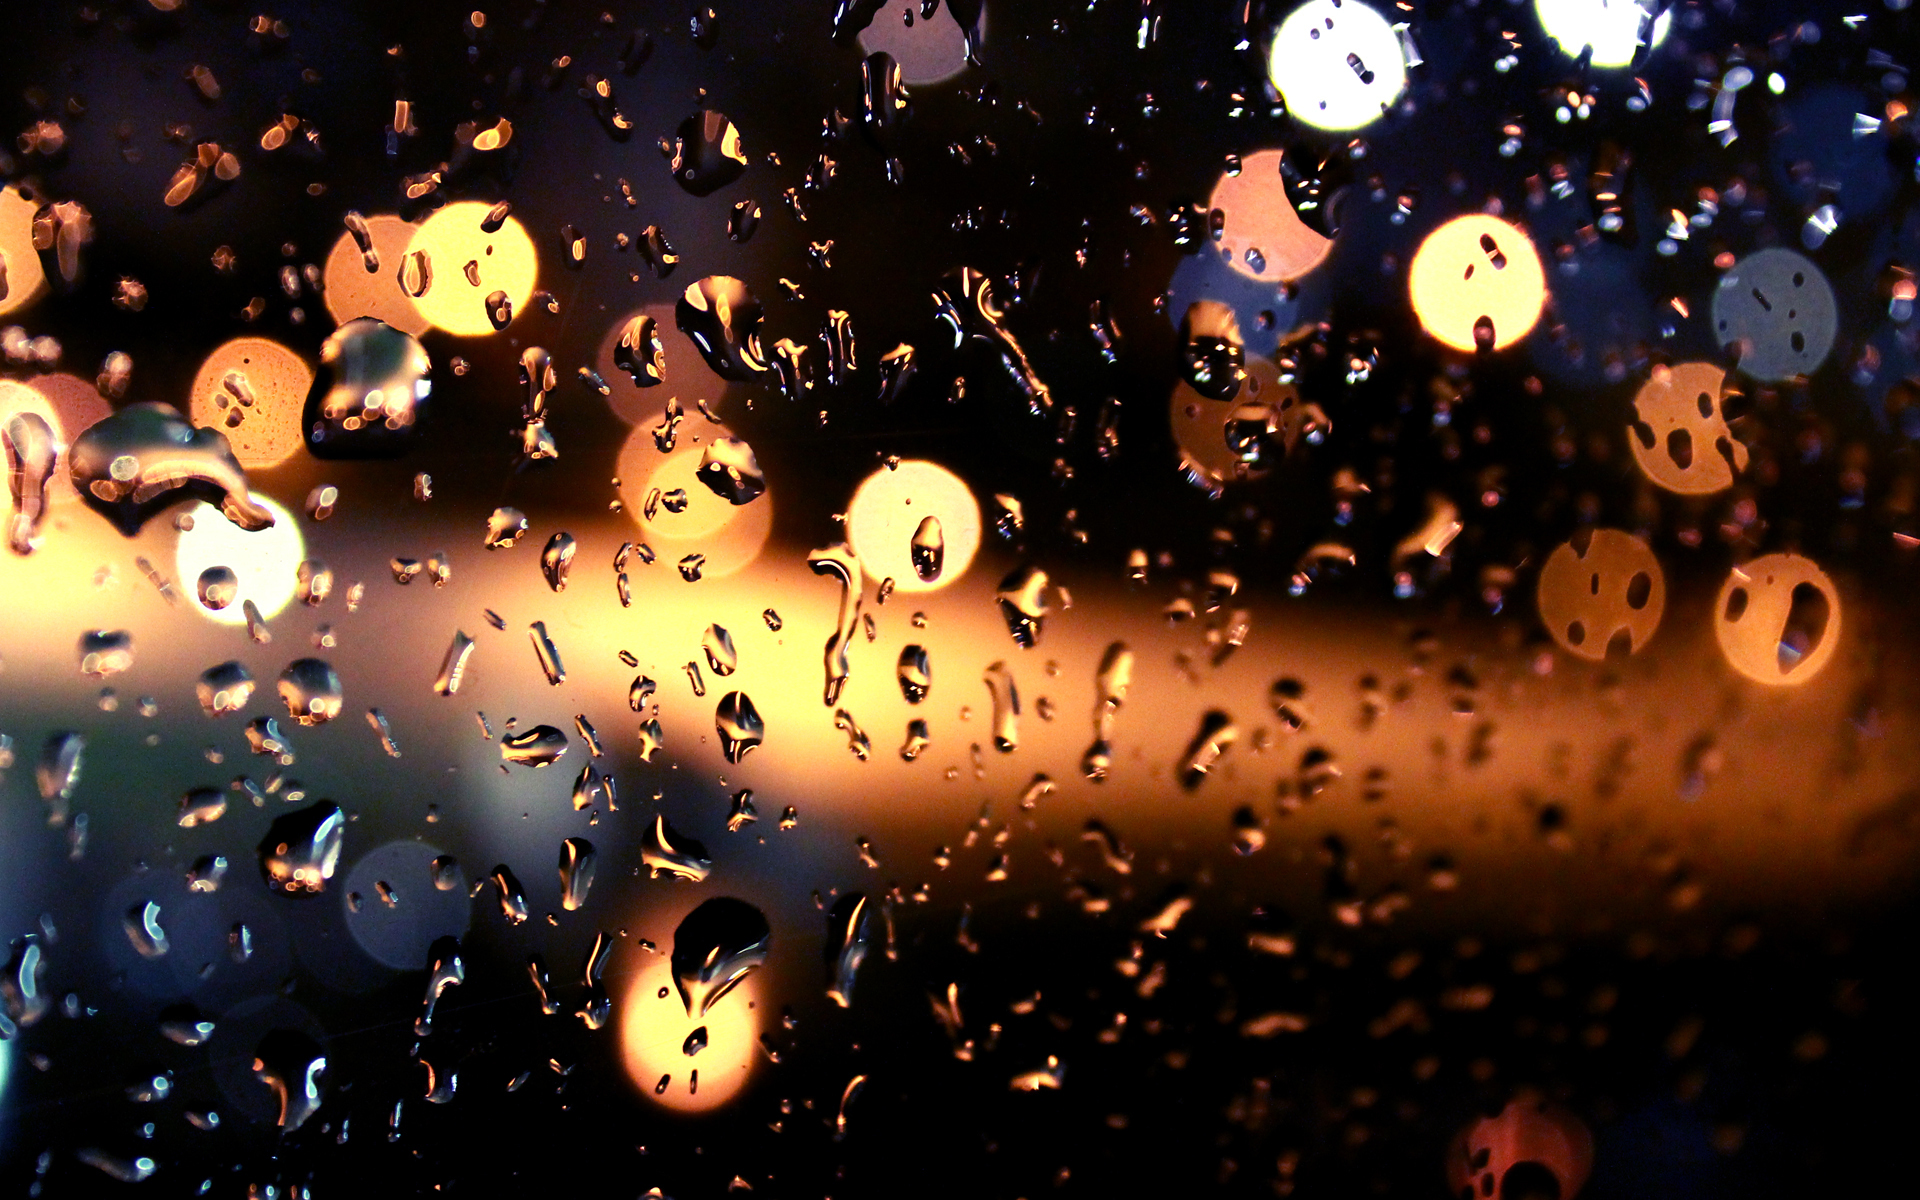 Raindrop Christmas Lights